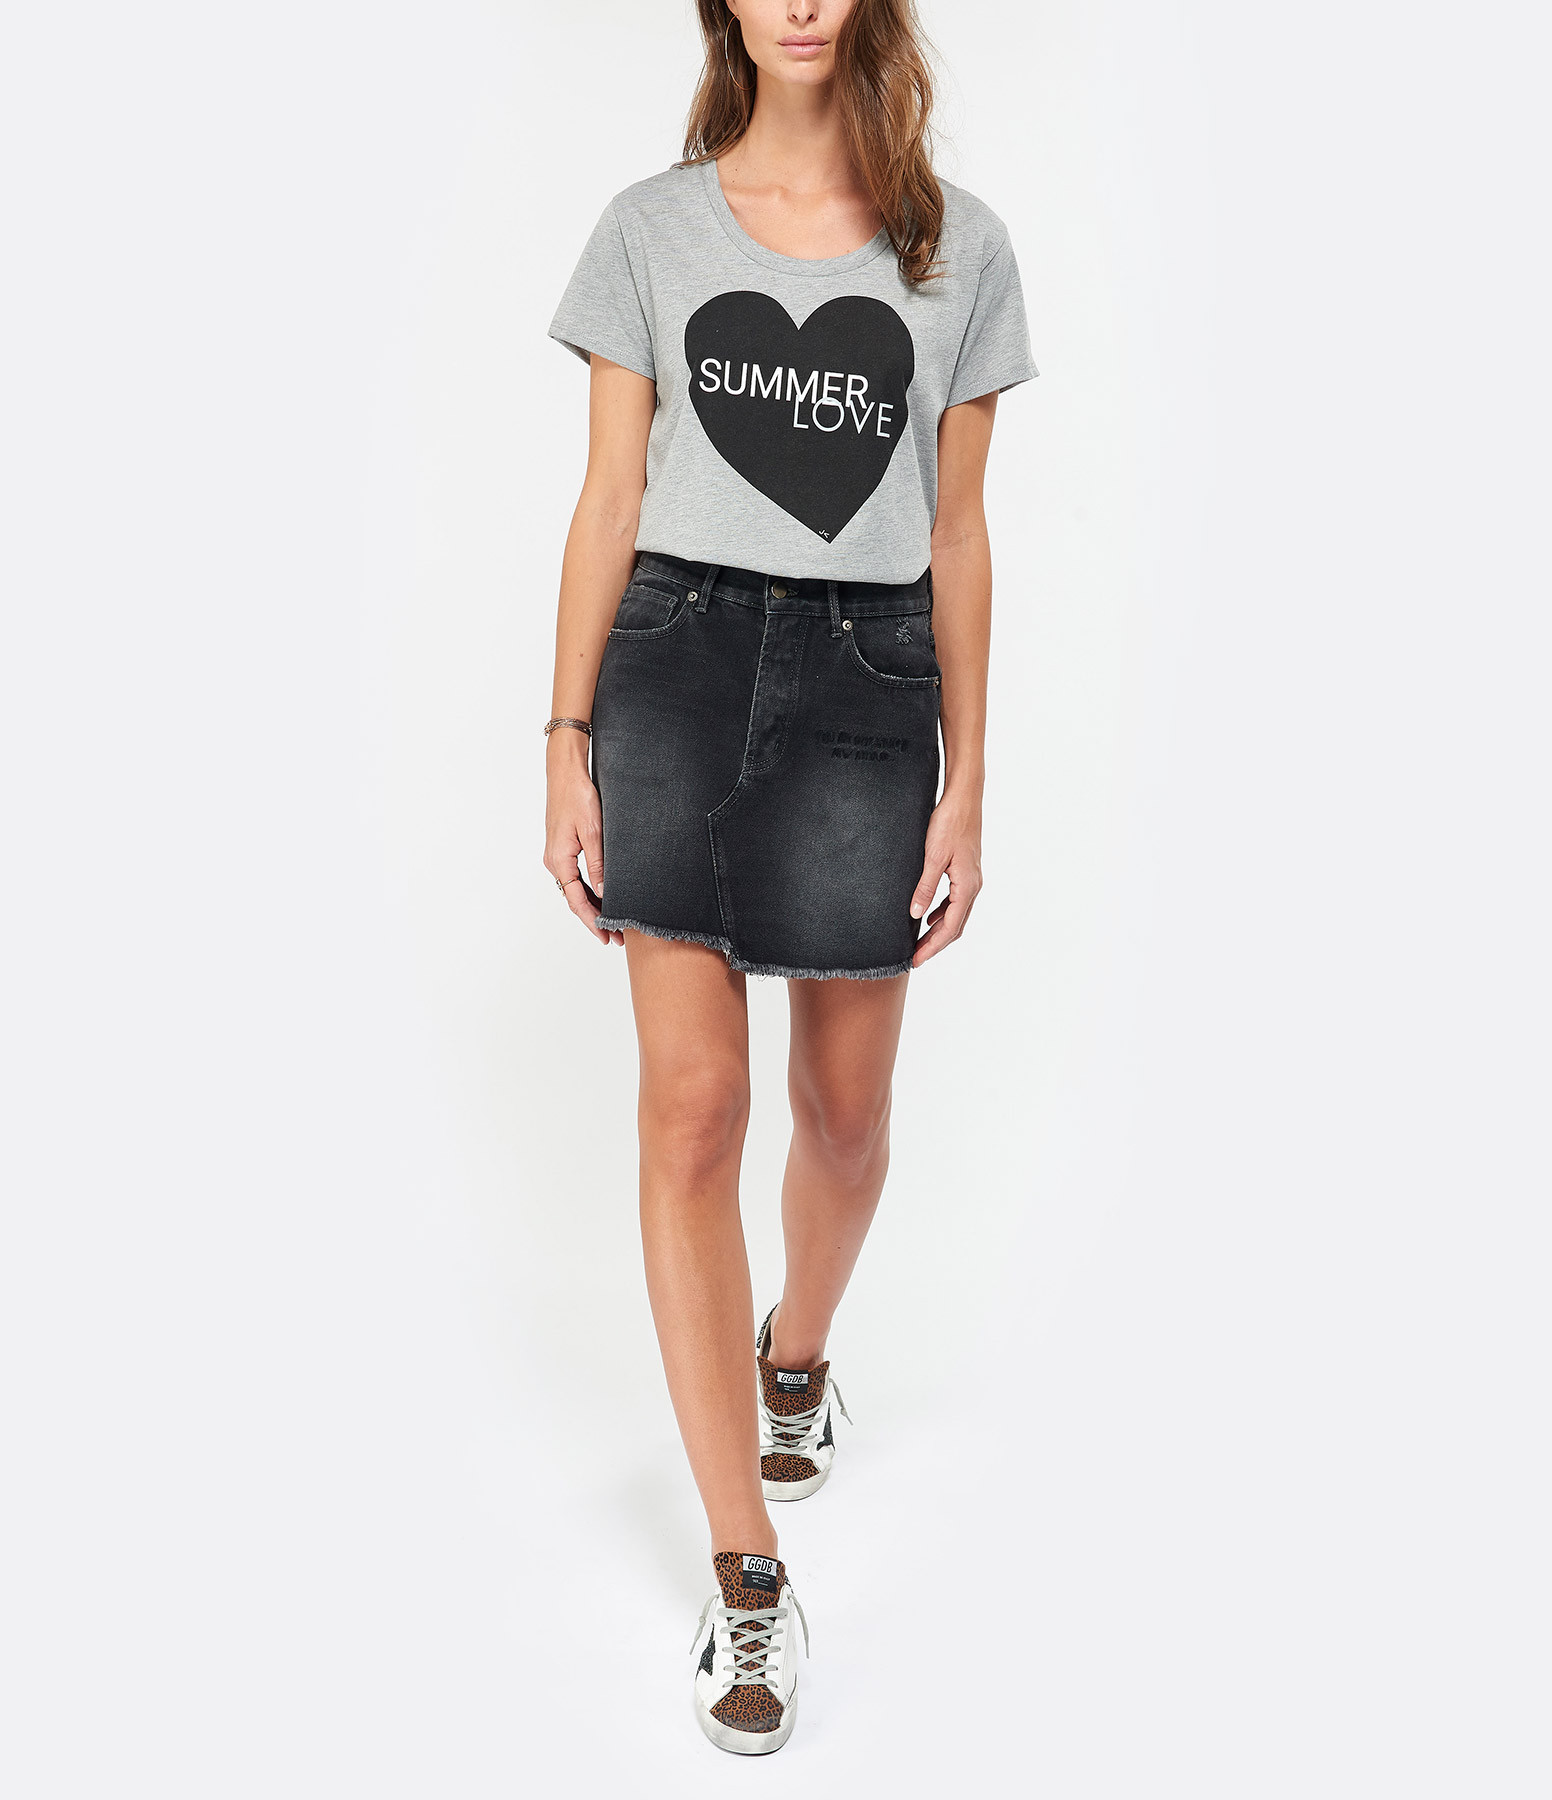 JEANNE VOULAND - Tee-shirt Bob Summer Love Gris Imprimé Noir